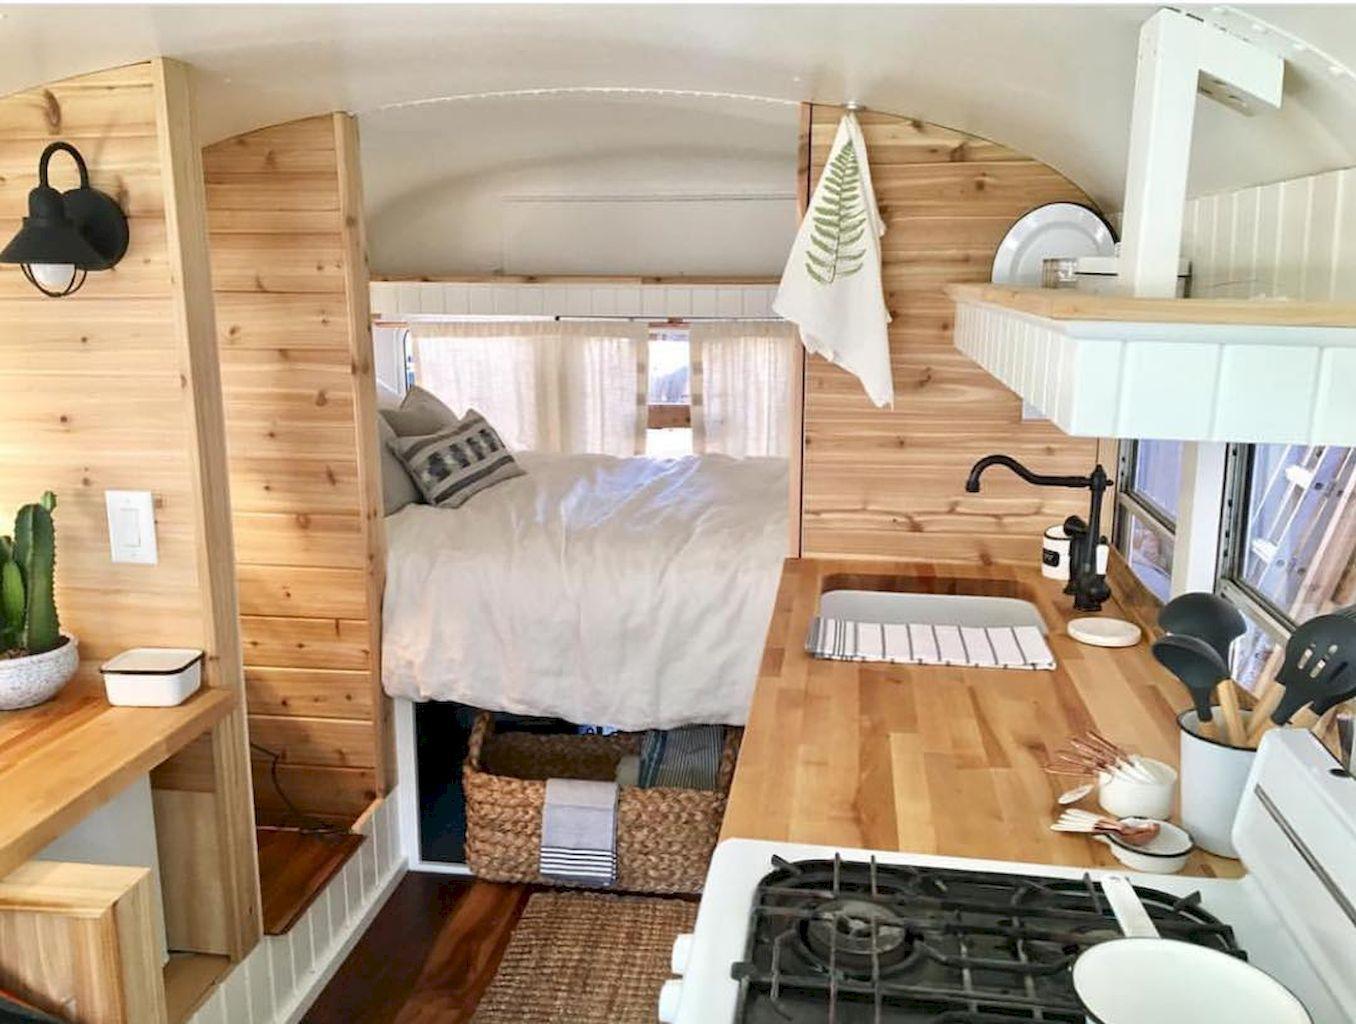 School Bus Camper Interior And Plans Ideas To Nostalgic Livingmarch 20 Wild Wonderful